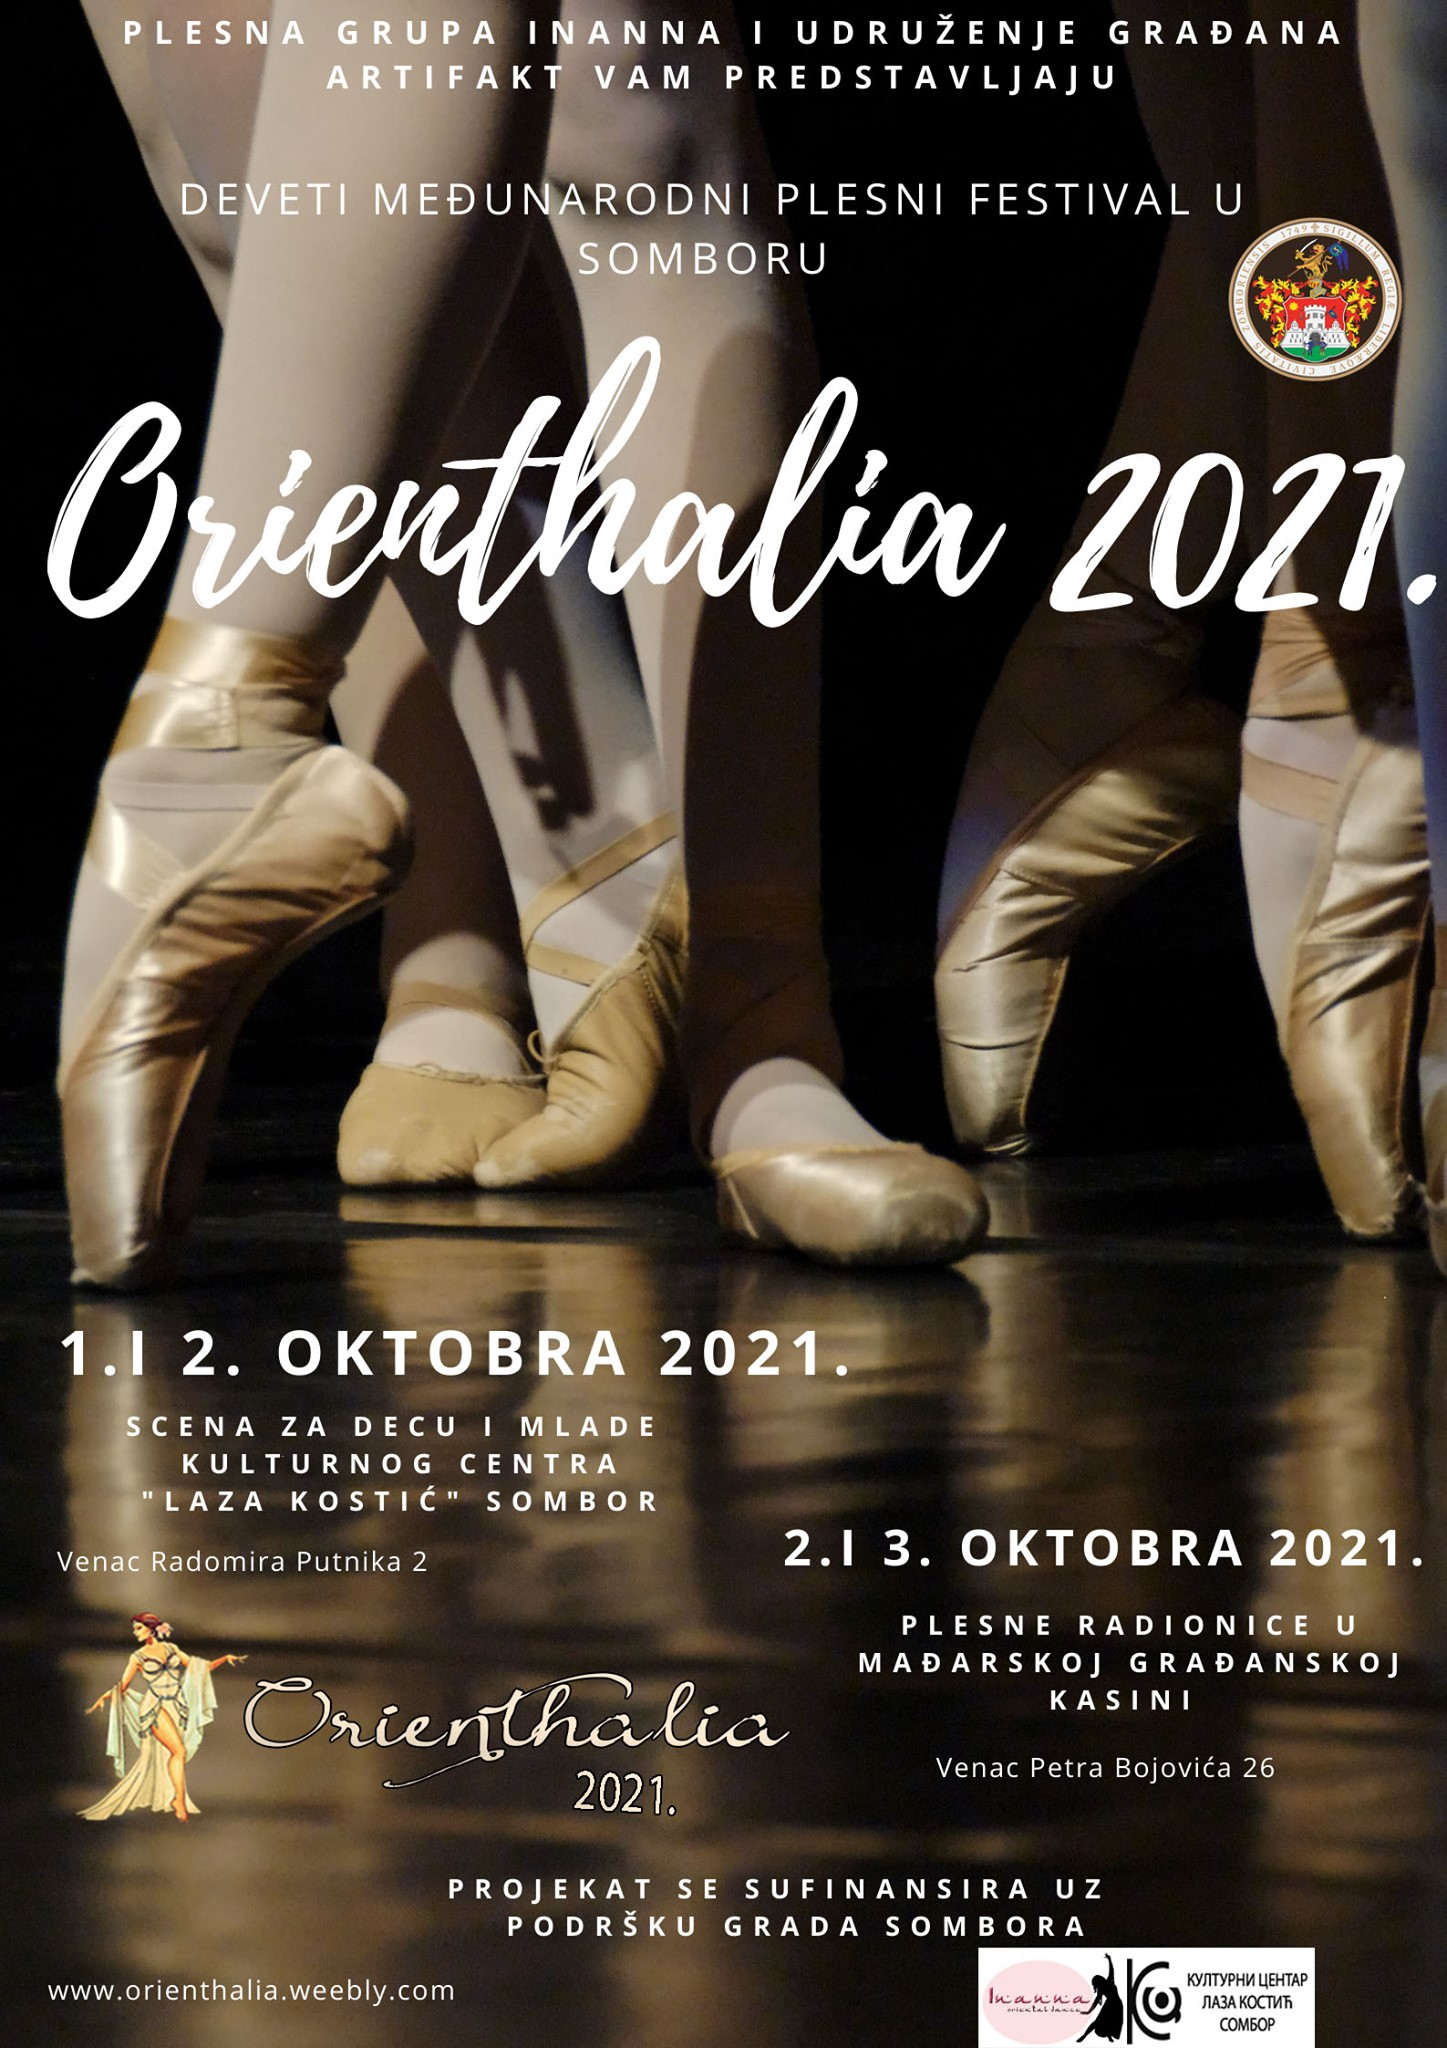 plakat-9-medjunarodni-plesni-festival-orijentalija-2021-sombor